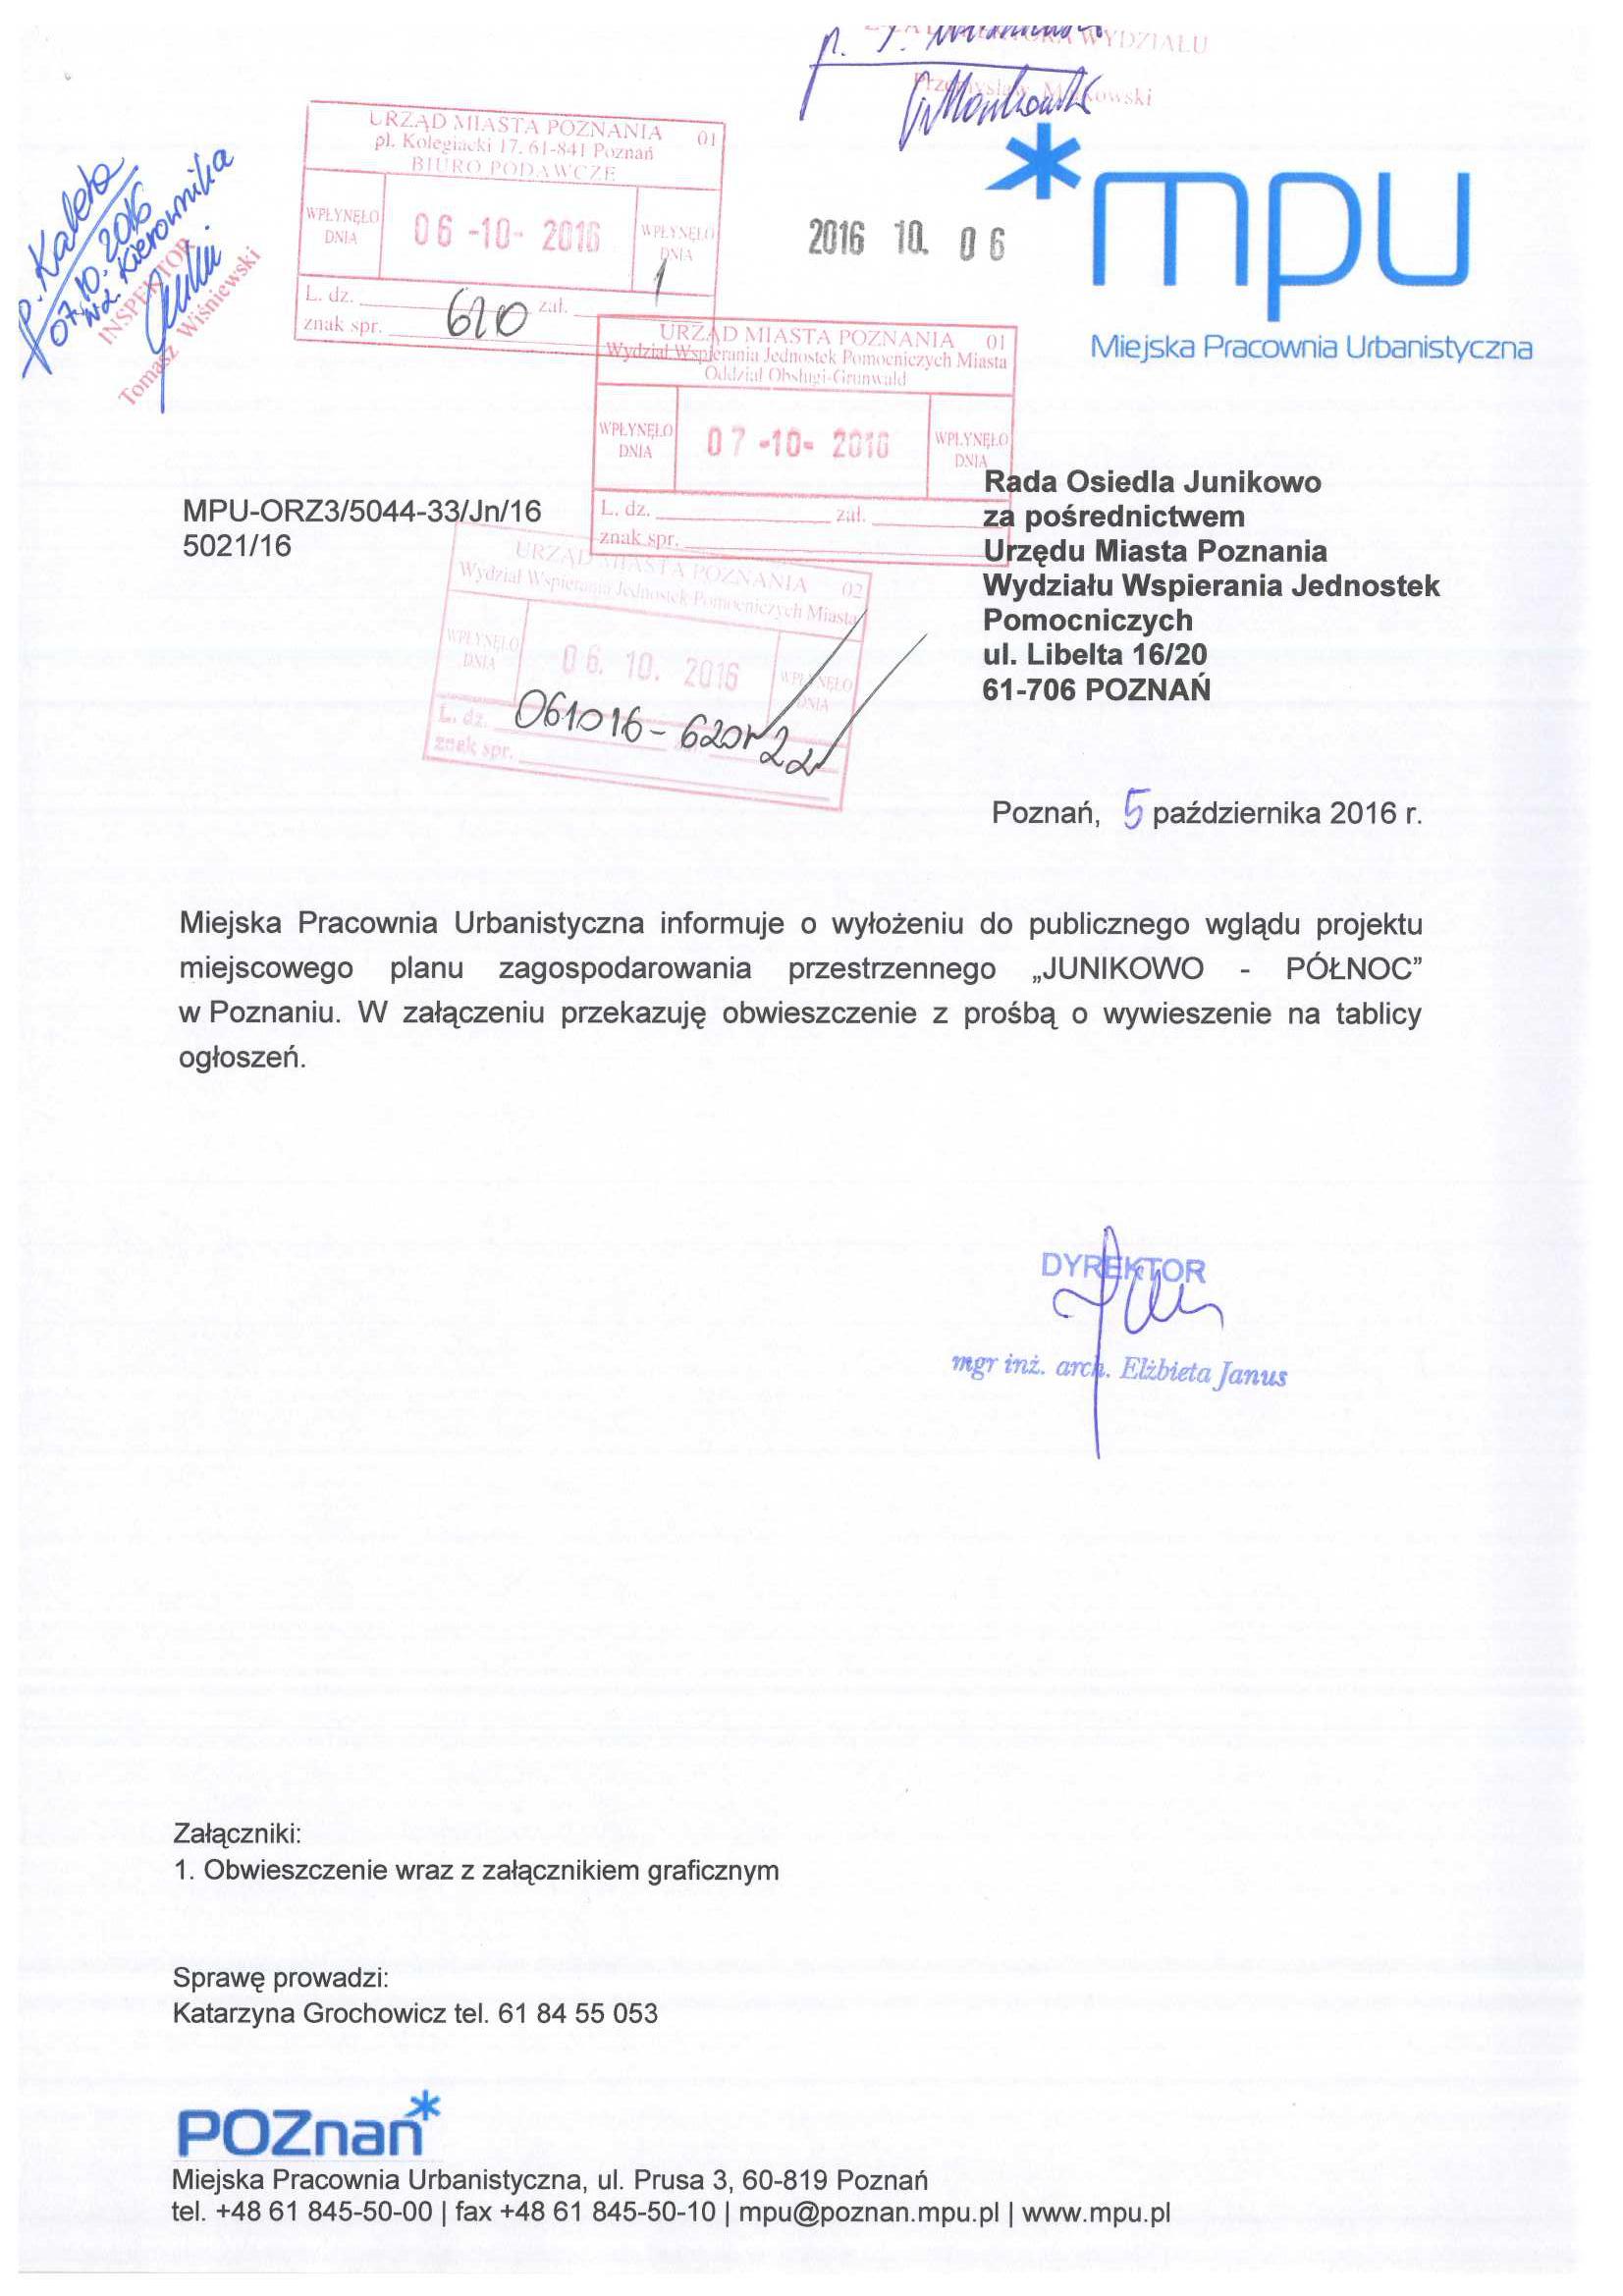 junikowo_polnoc-1